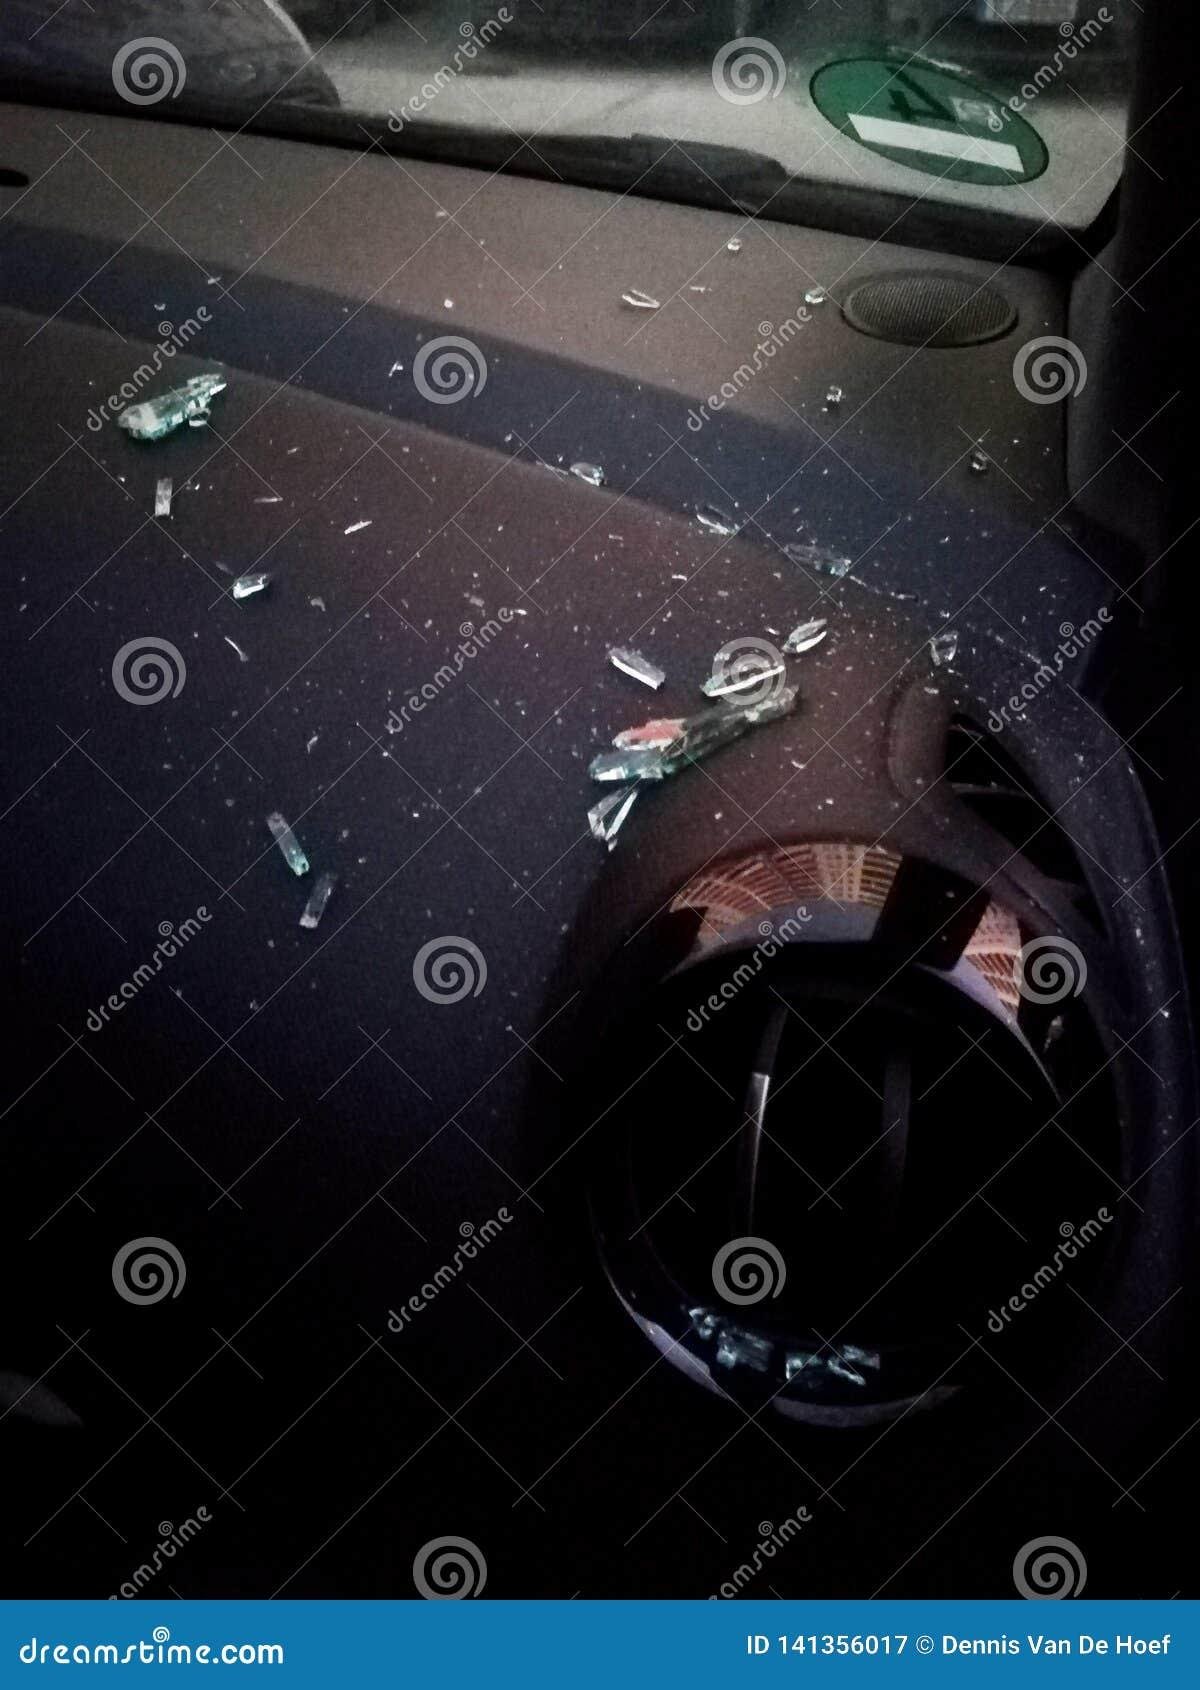 A broken car triangular window.